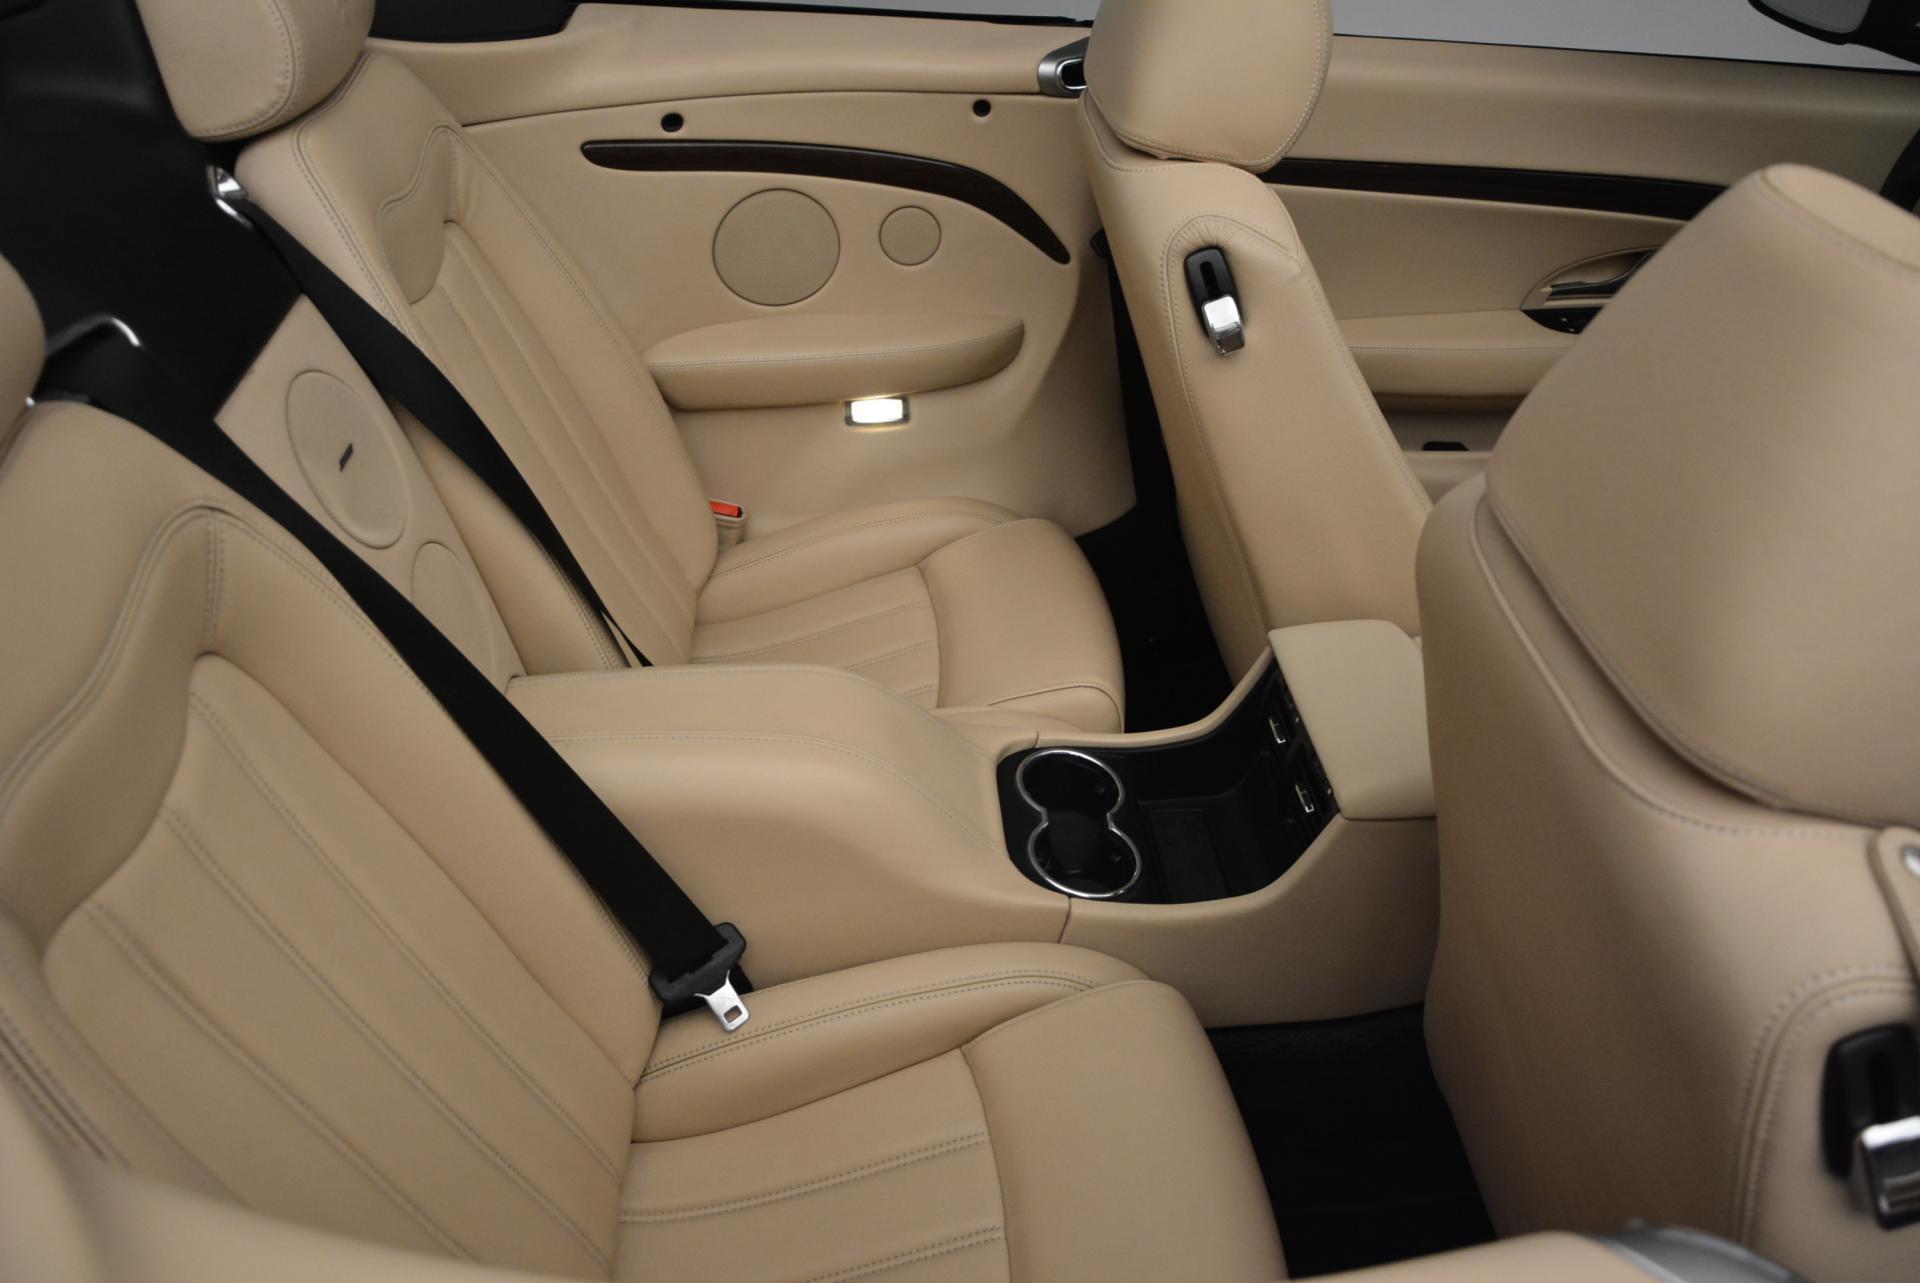 Used 2011 Maserati GranTurismo Base For Sale In Westport, CT 158_p35